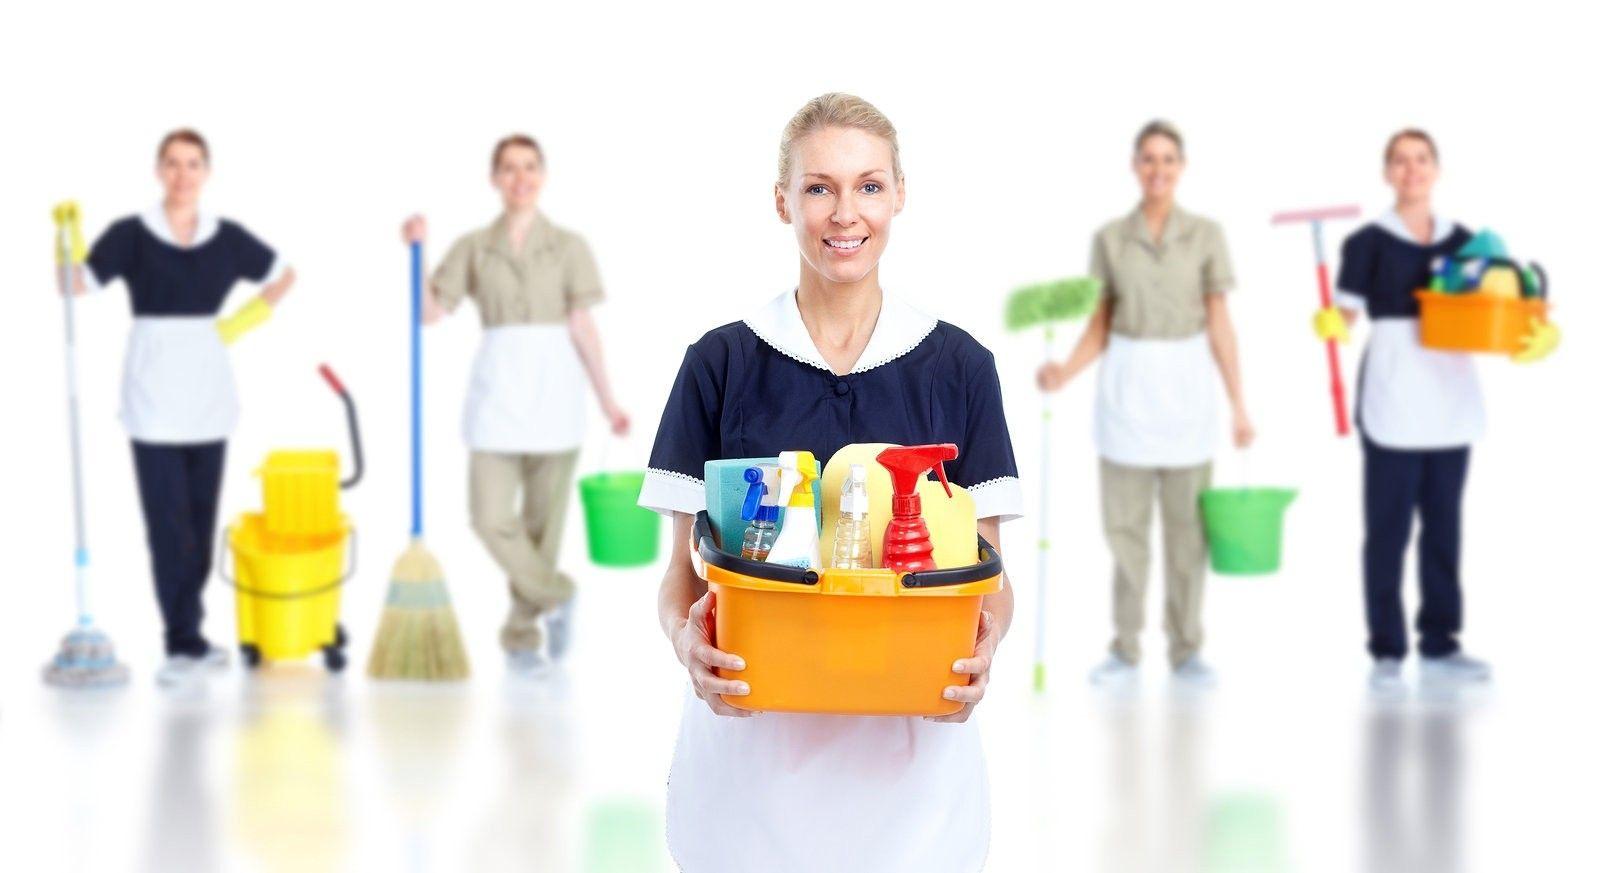 Terceirização de Limpeza Predial Preço na Saúde - Empresa de Terceirização de Limpeza